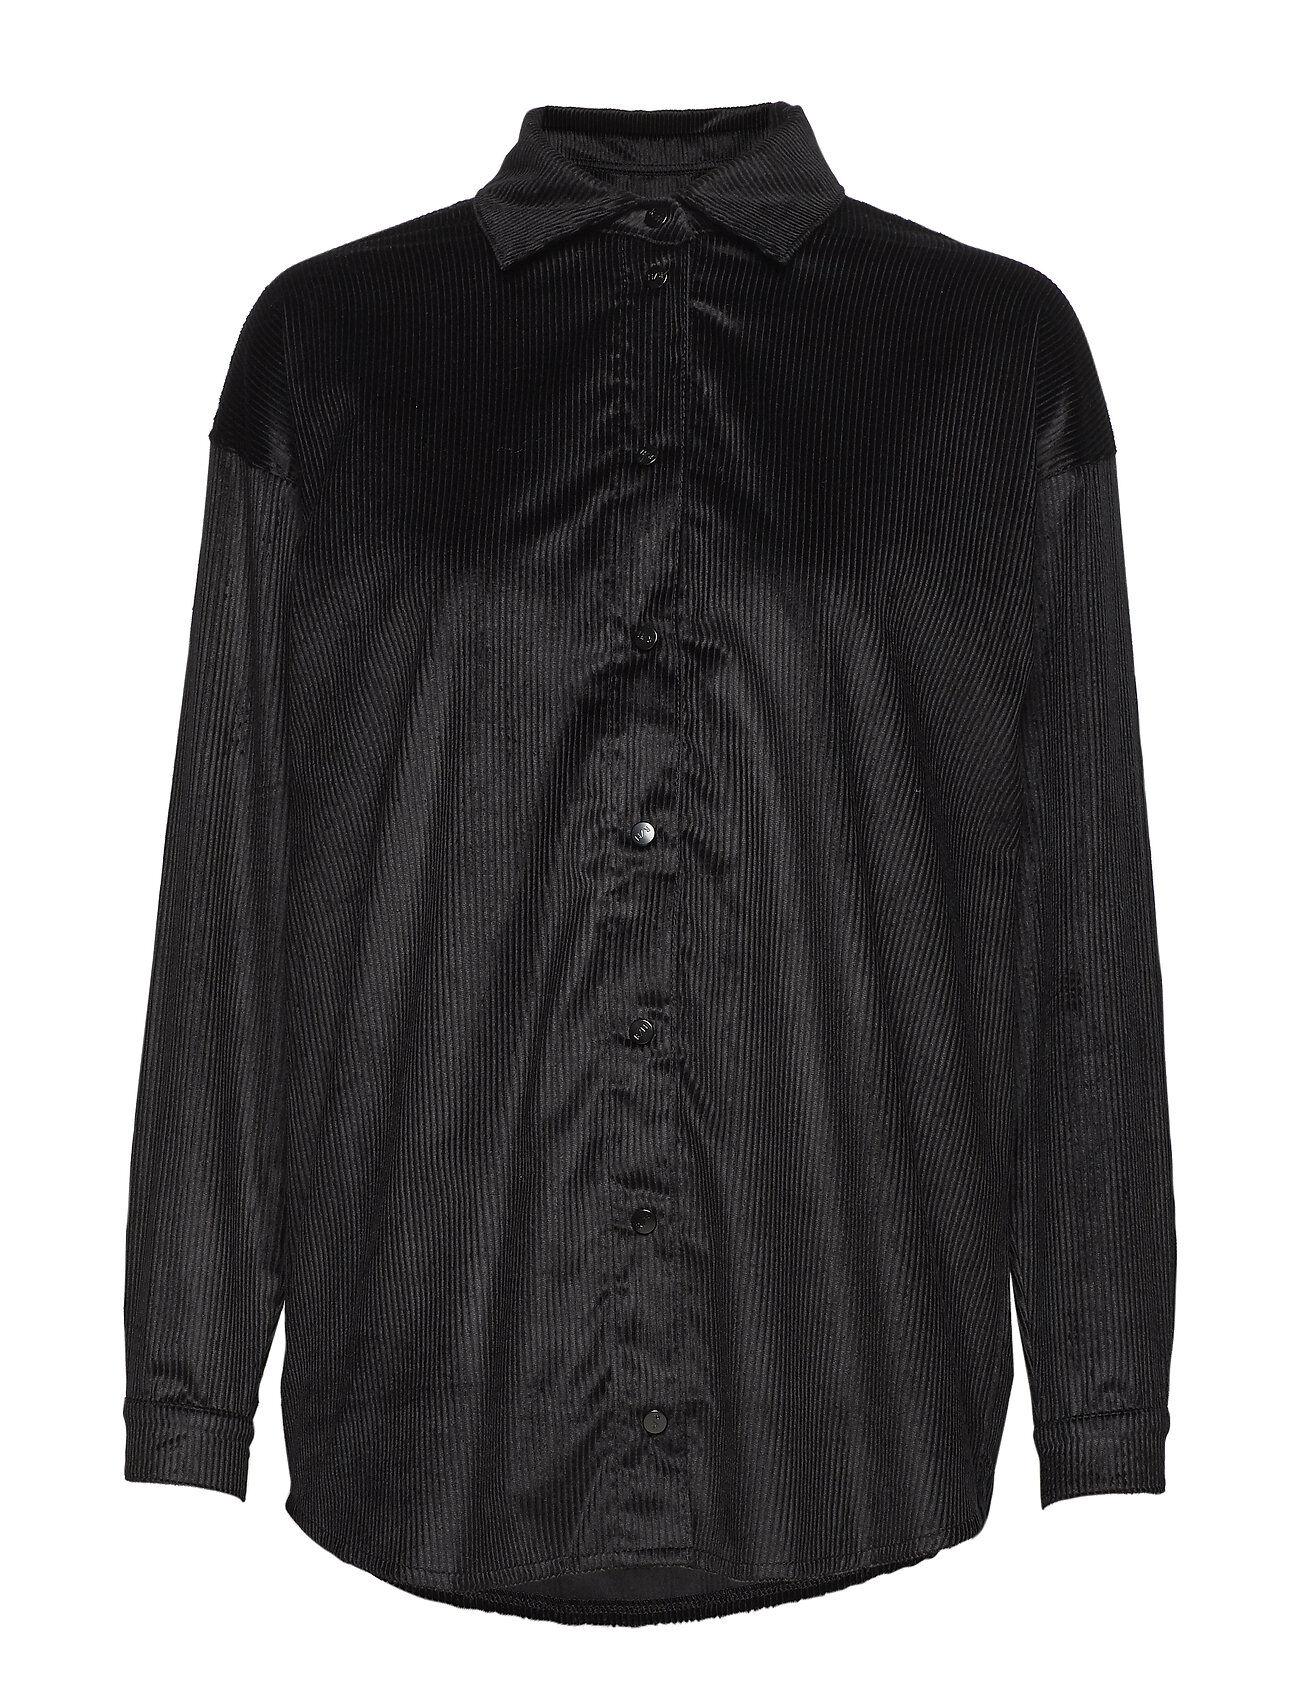 R/H Studio Abi Collar Shirt Pitkähihainen Pusero Paita Musta